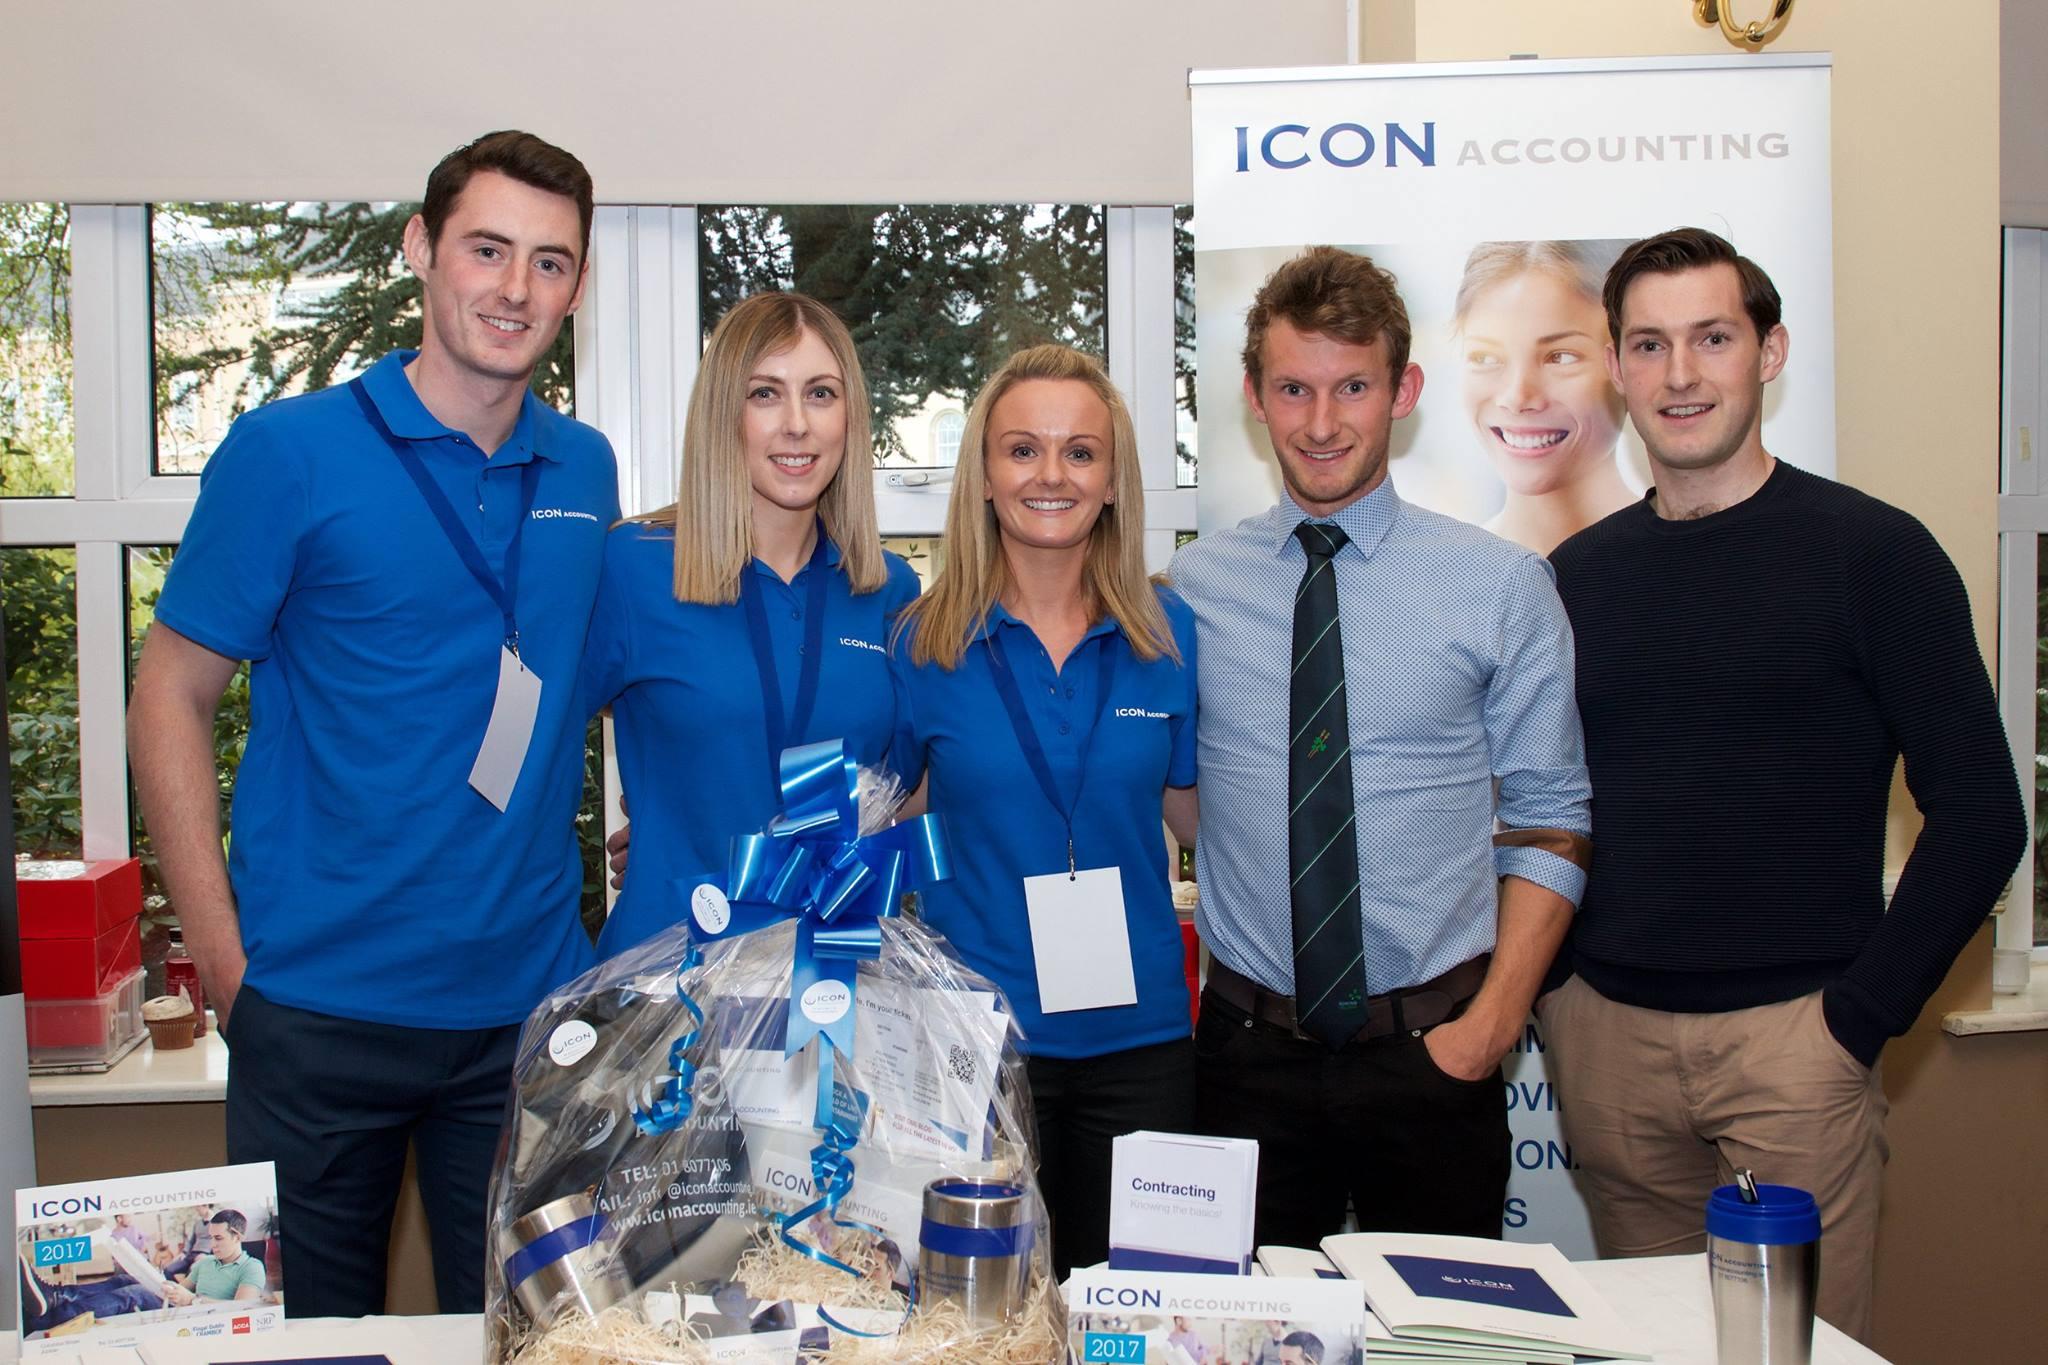 Icon Accounting - Dublin Informative